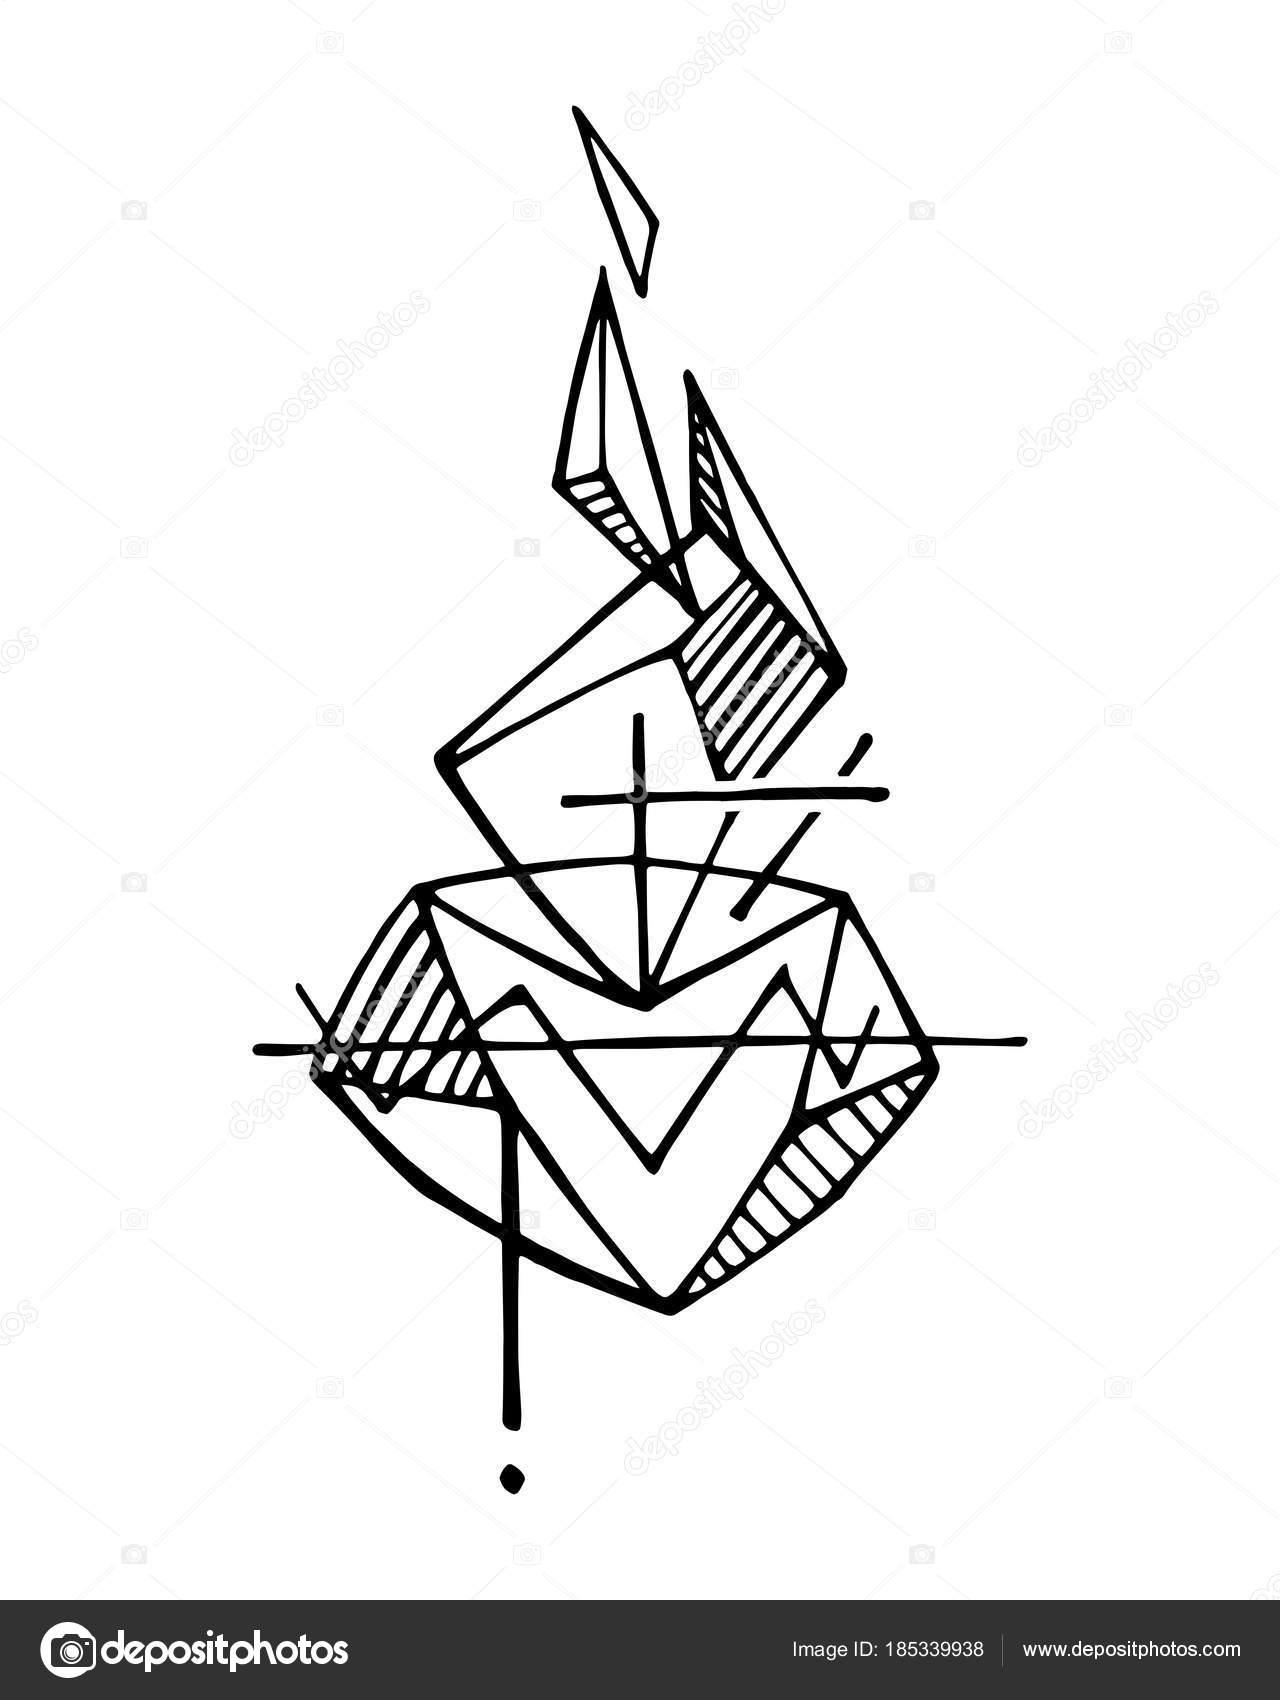 Imágenes Corazon De Jesus Dibujo Sagrado Corazón De Jesús Cristo